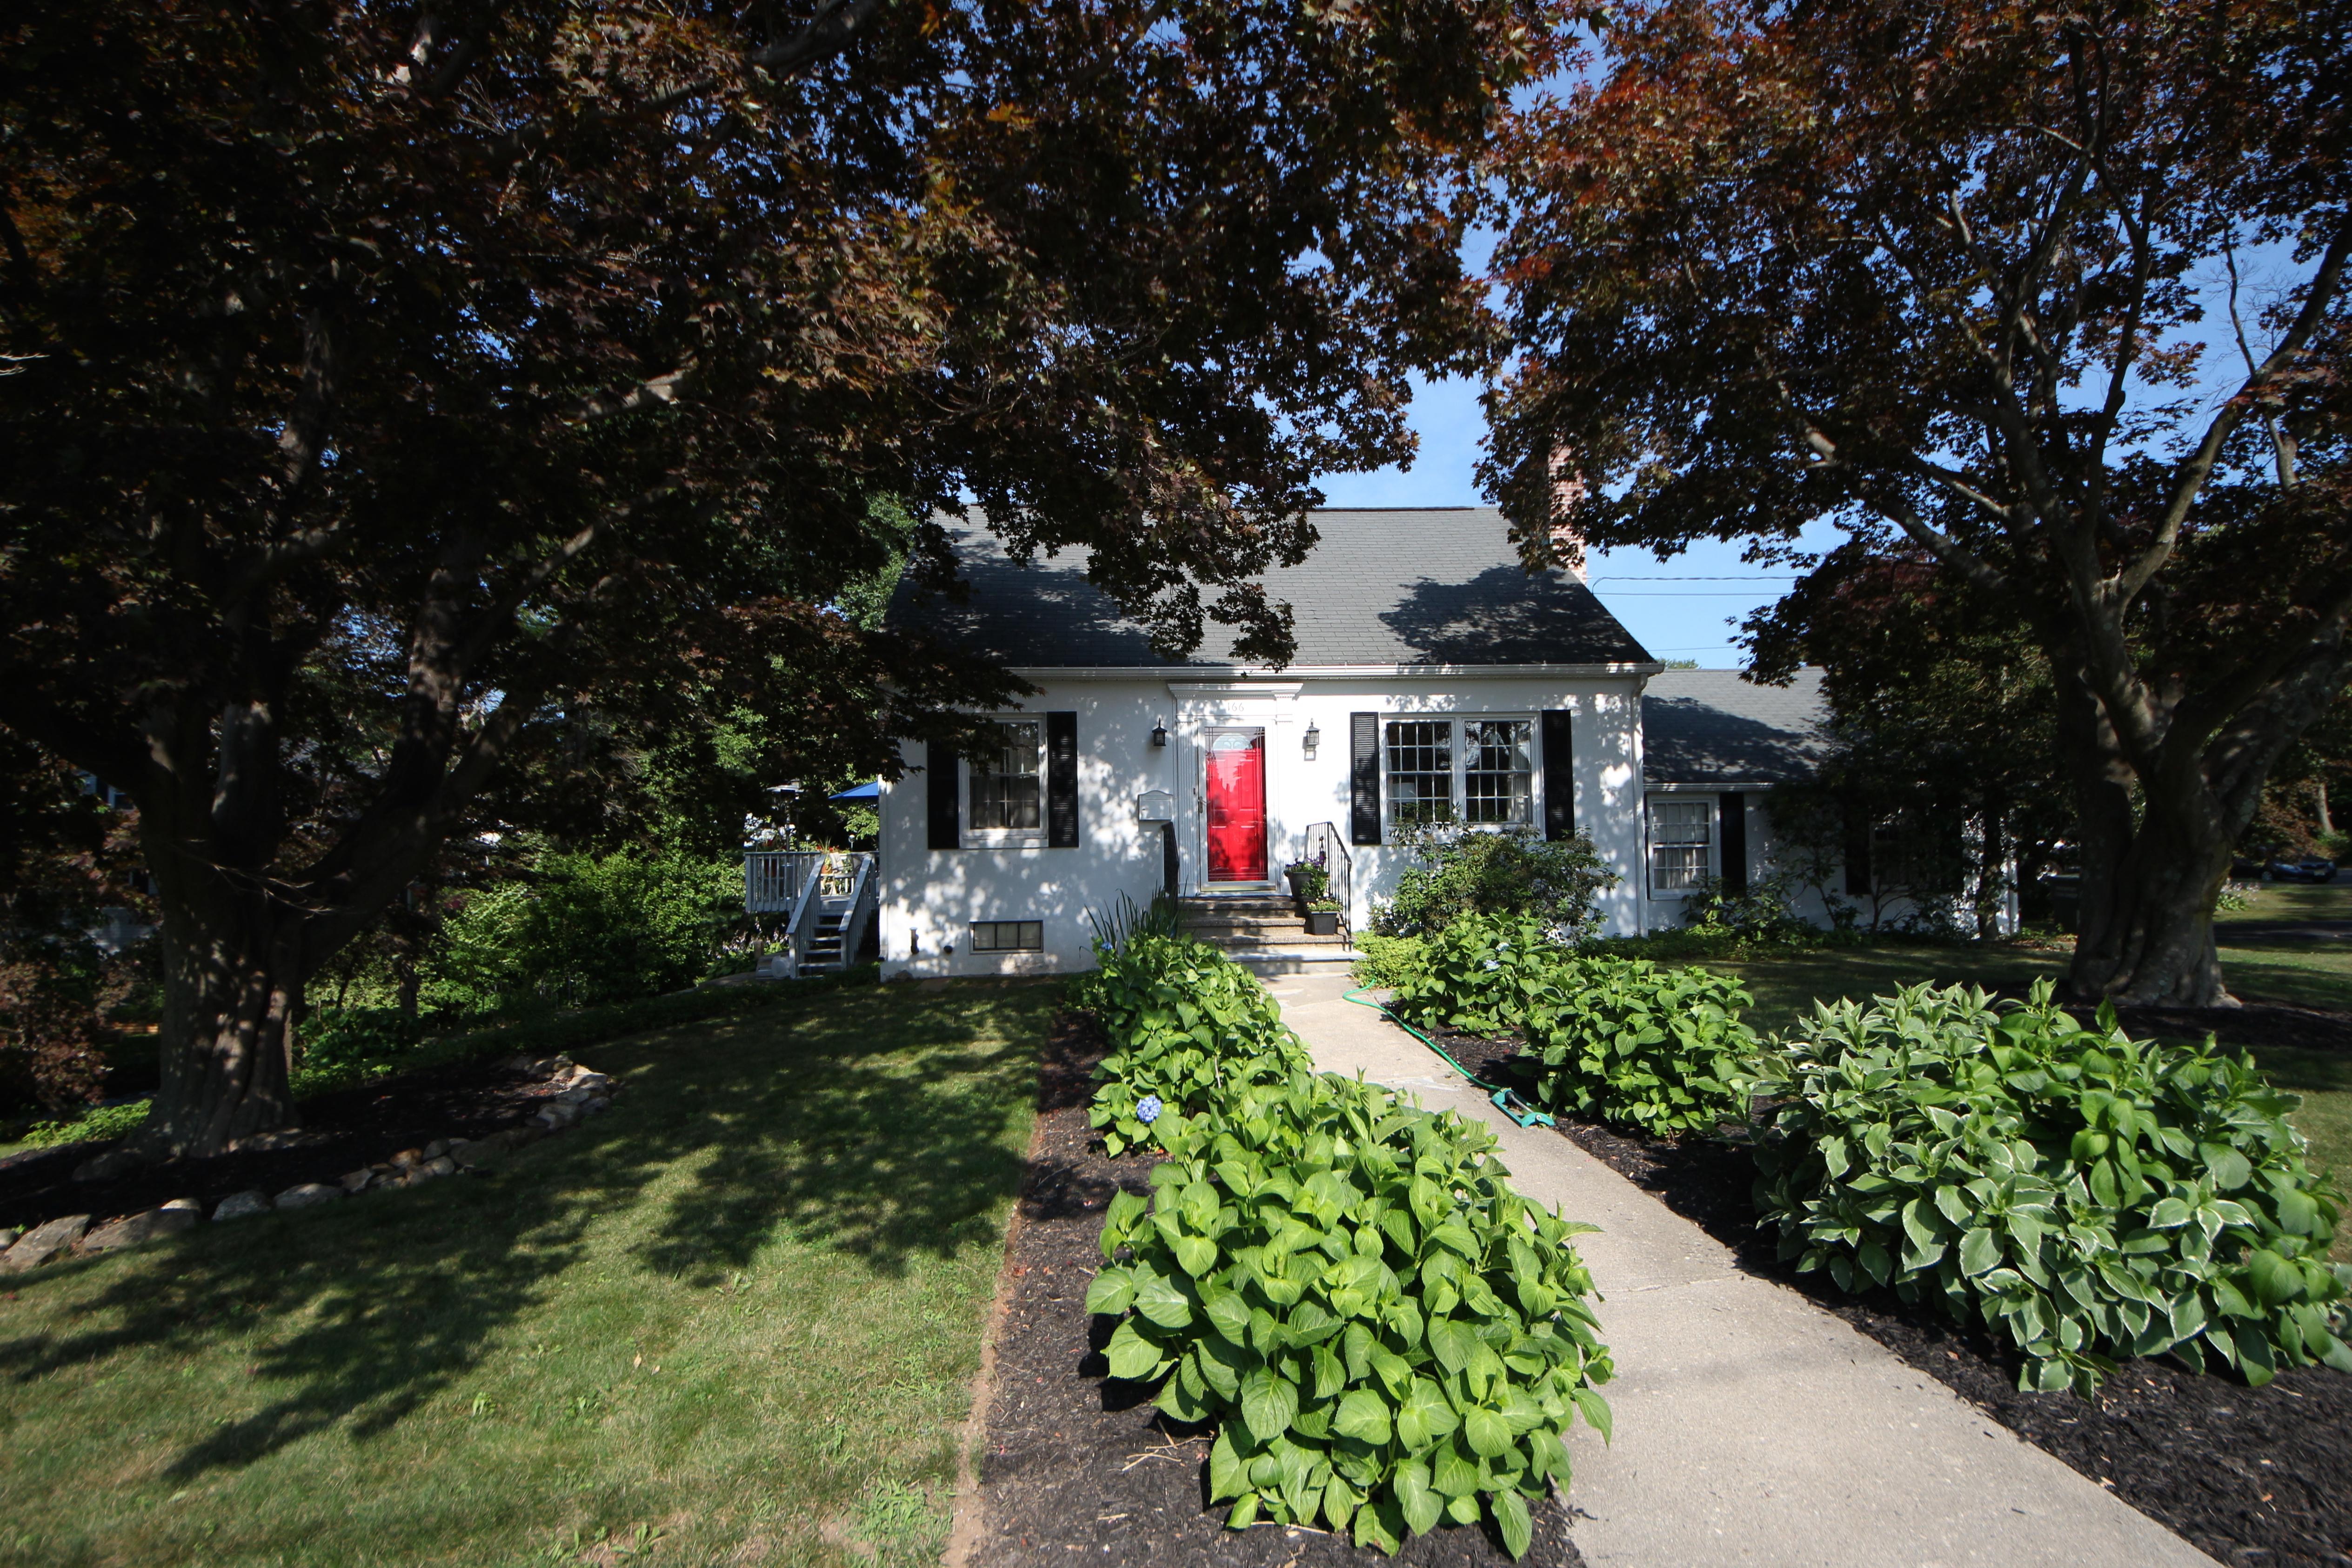 Casa para uma família para Venda às Attractive home in Lake Forest Association 166 Tesiny Circle Bridgeport, Connecticut, 06606 Estados Unidos